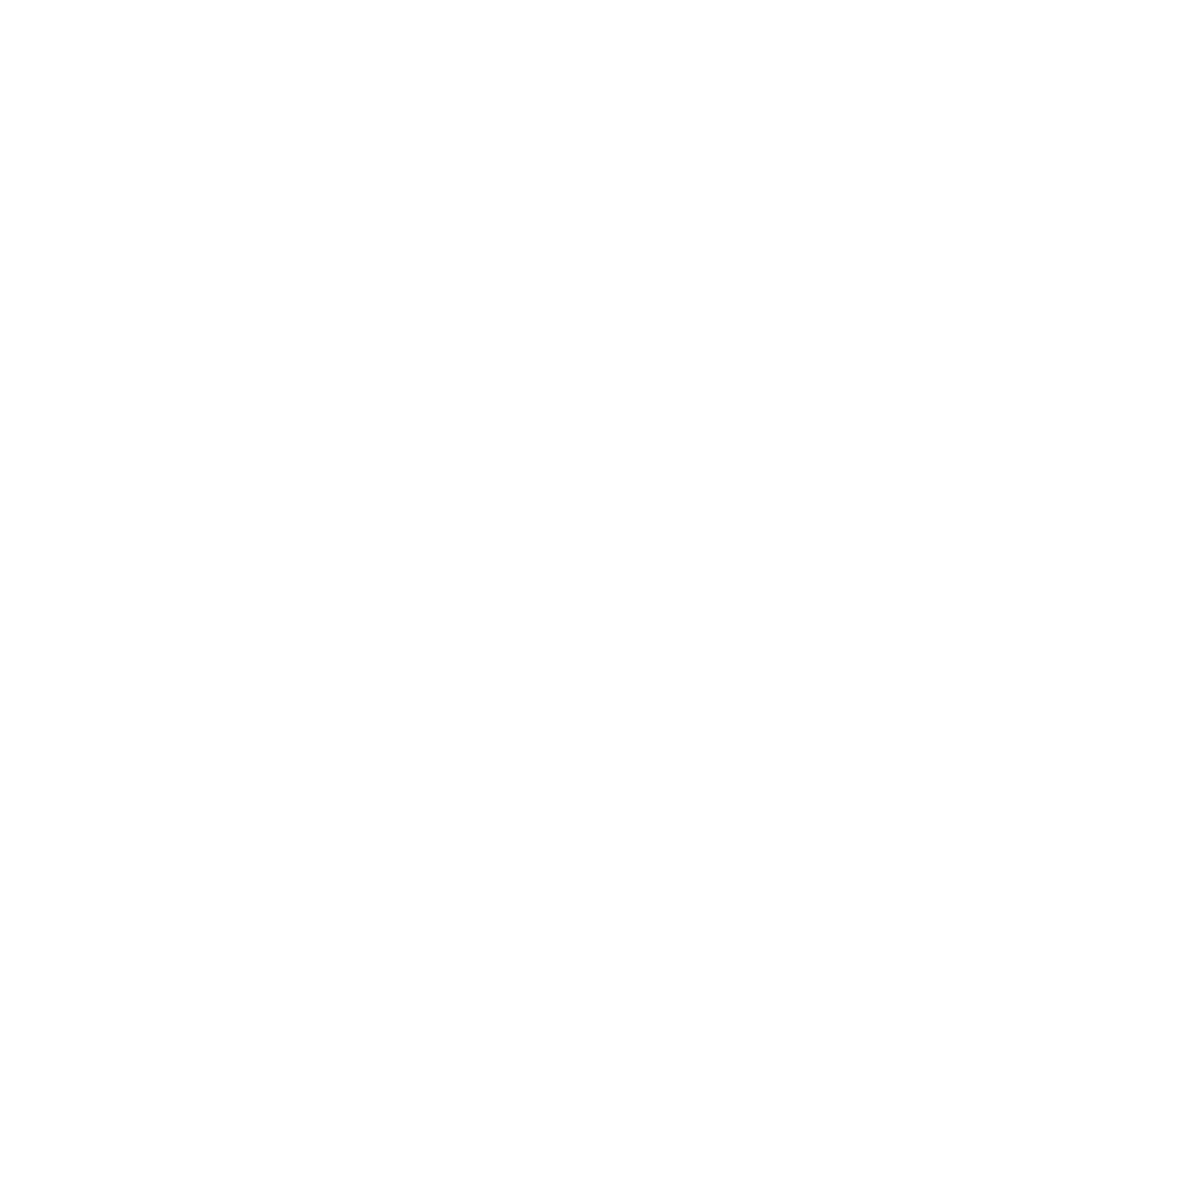 College Logos7.png